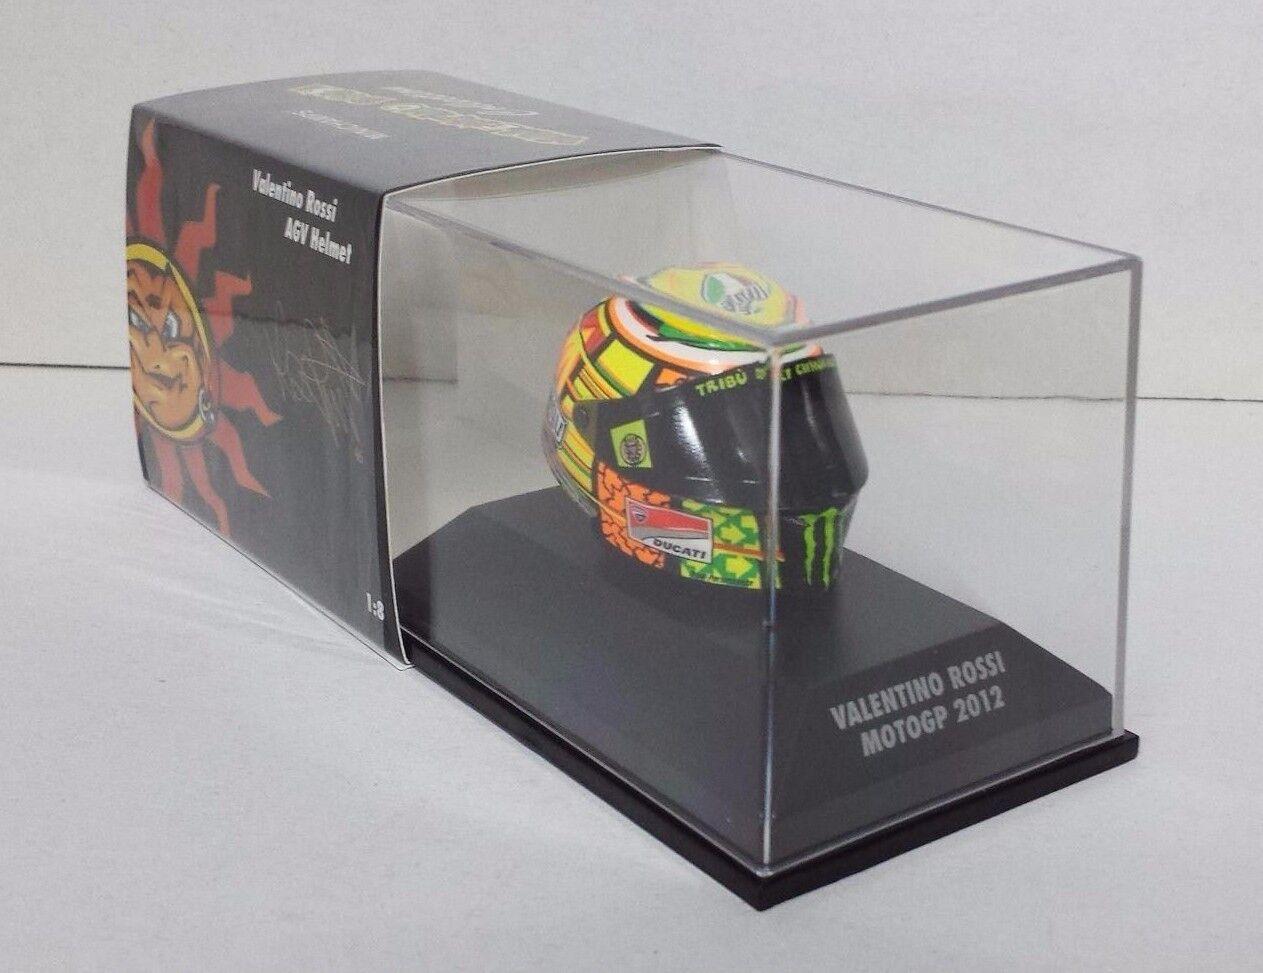 MINICHAMPS VALENTINO ROSSI MODELL AGV HELM HELMET 1 8 MOTO GP 2012 DUCATI